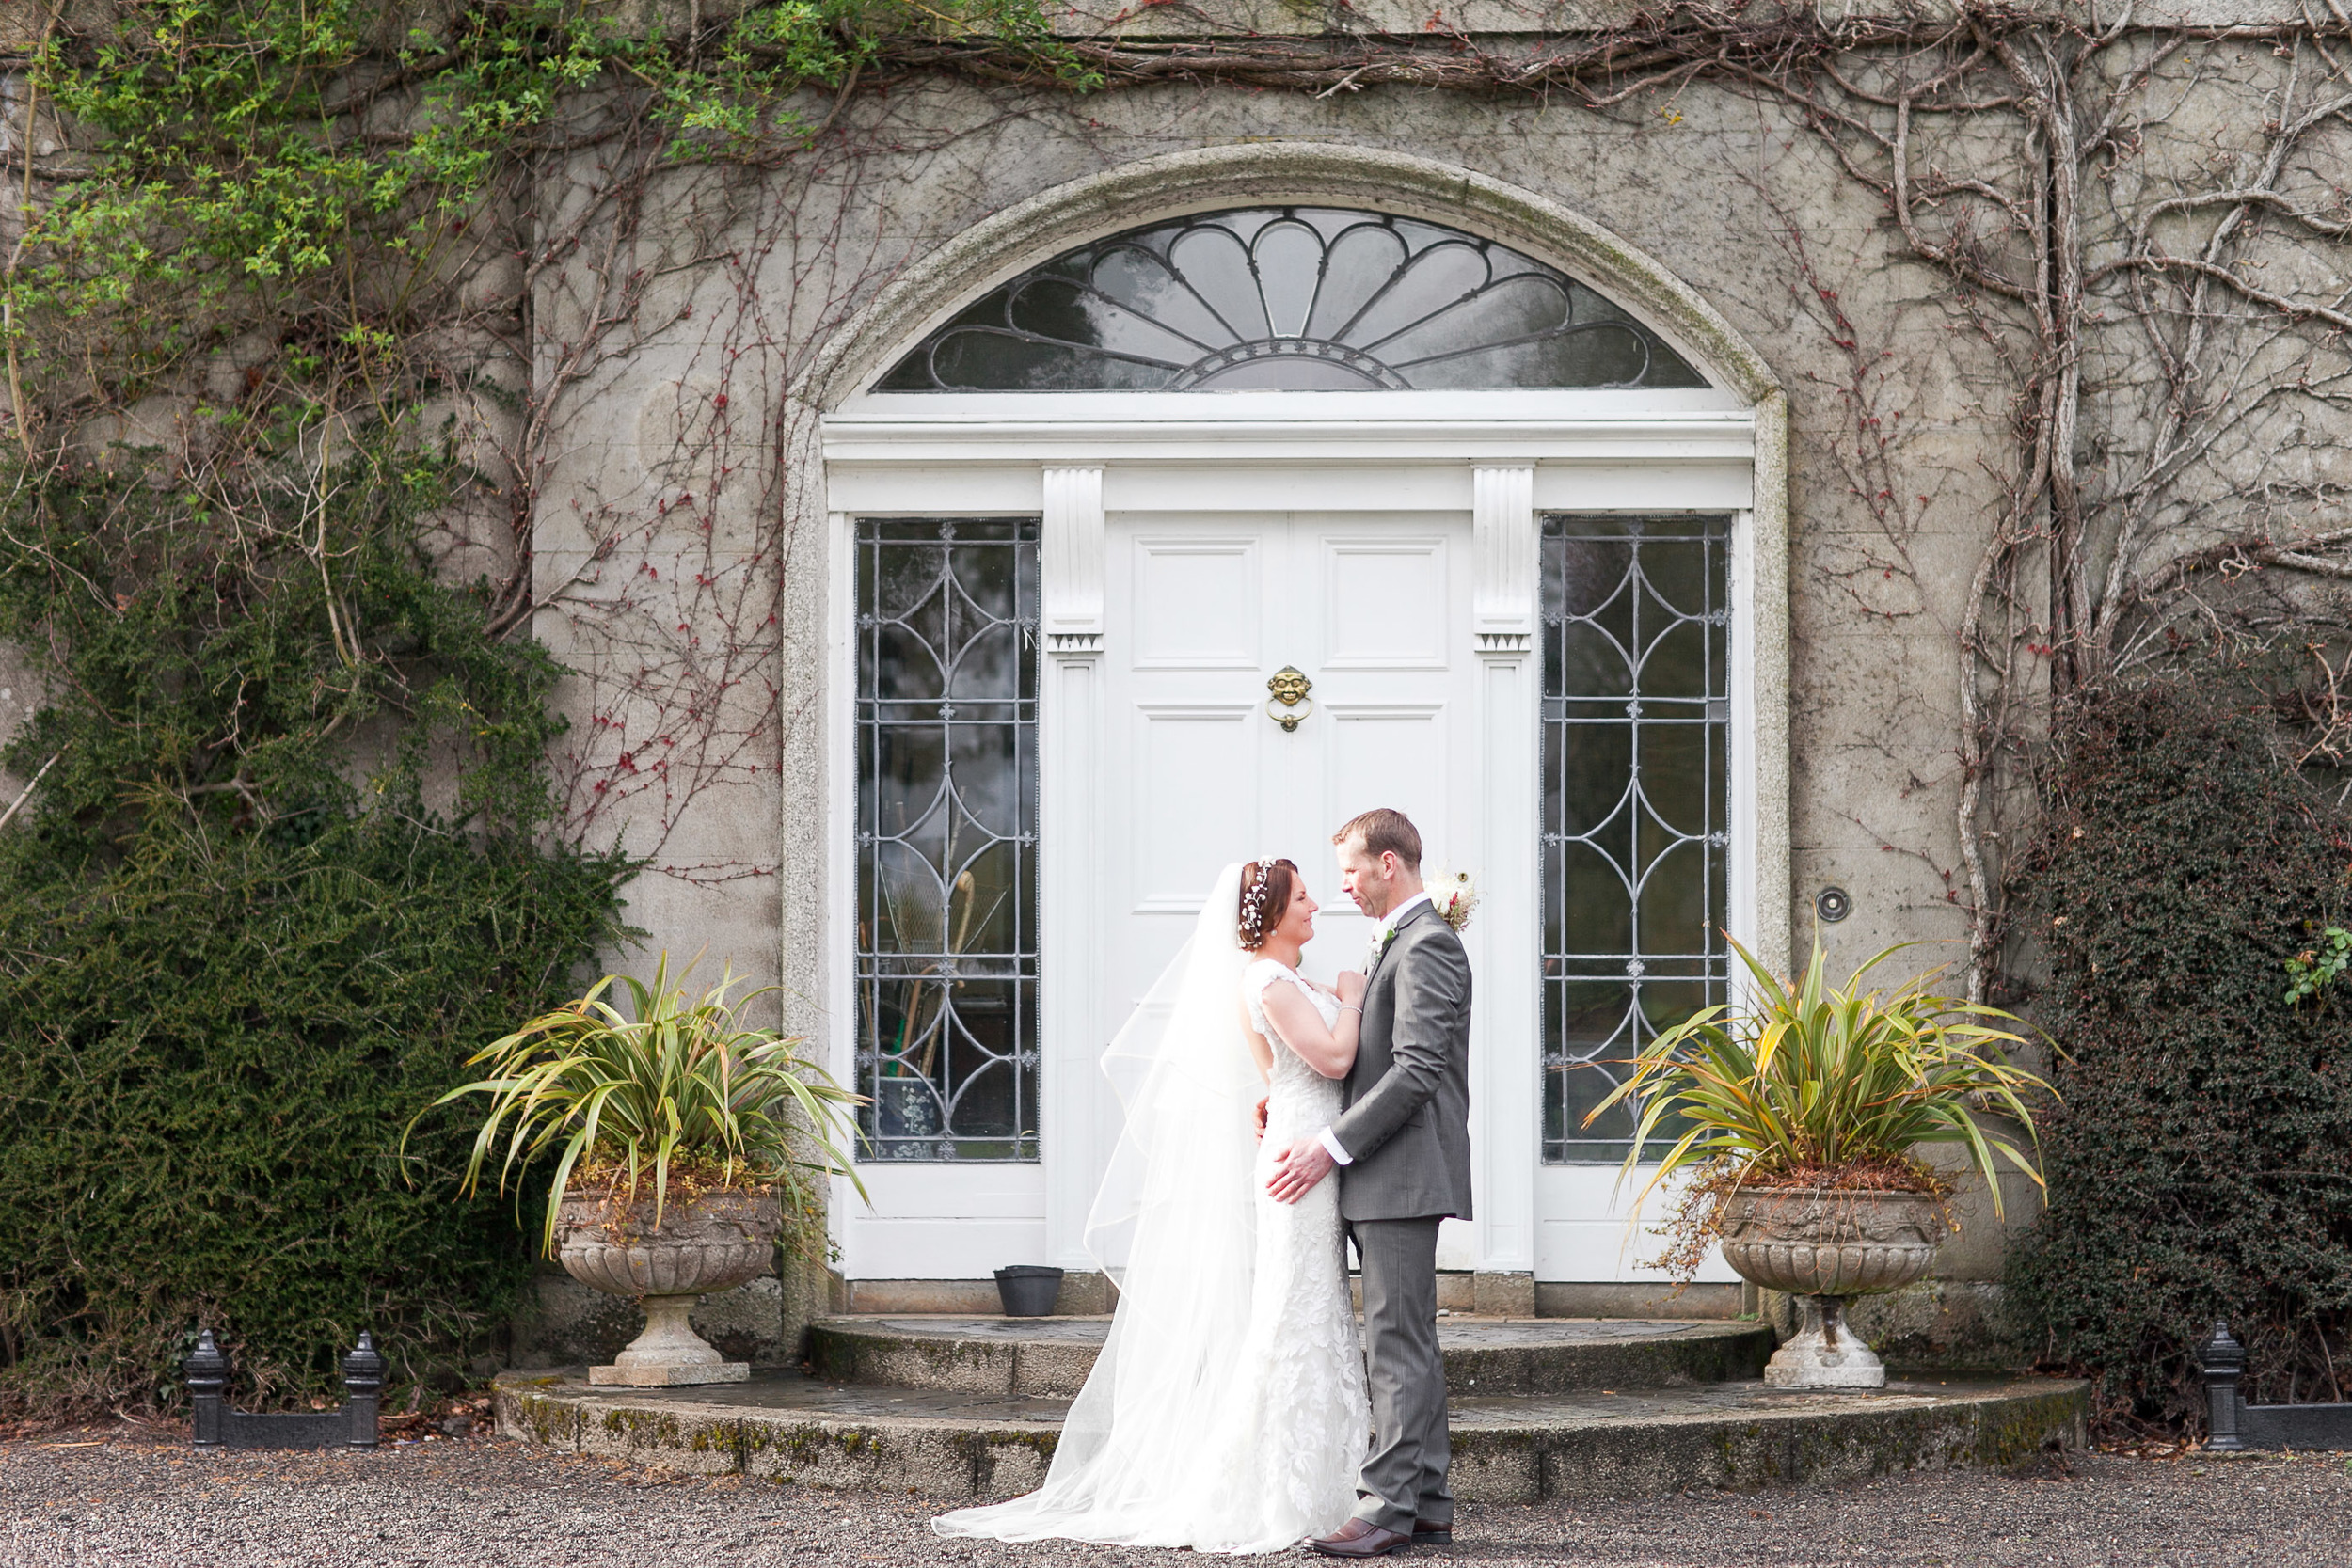 Ireland-Kildare-Wedding-Photographer-0043.jpg